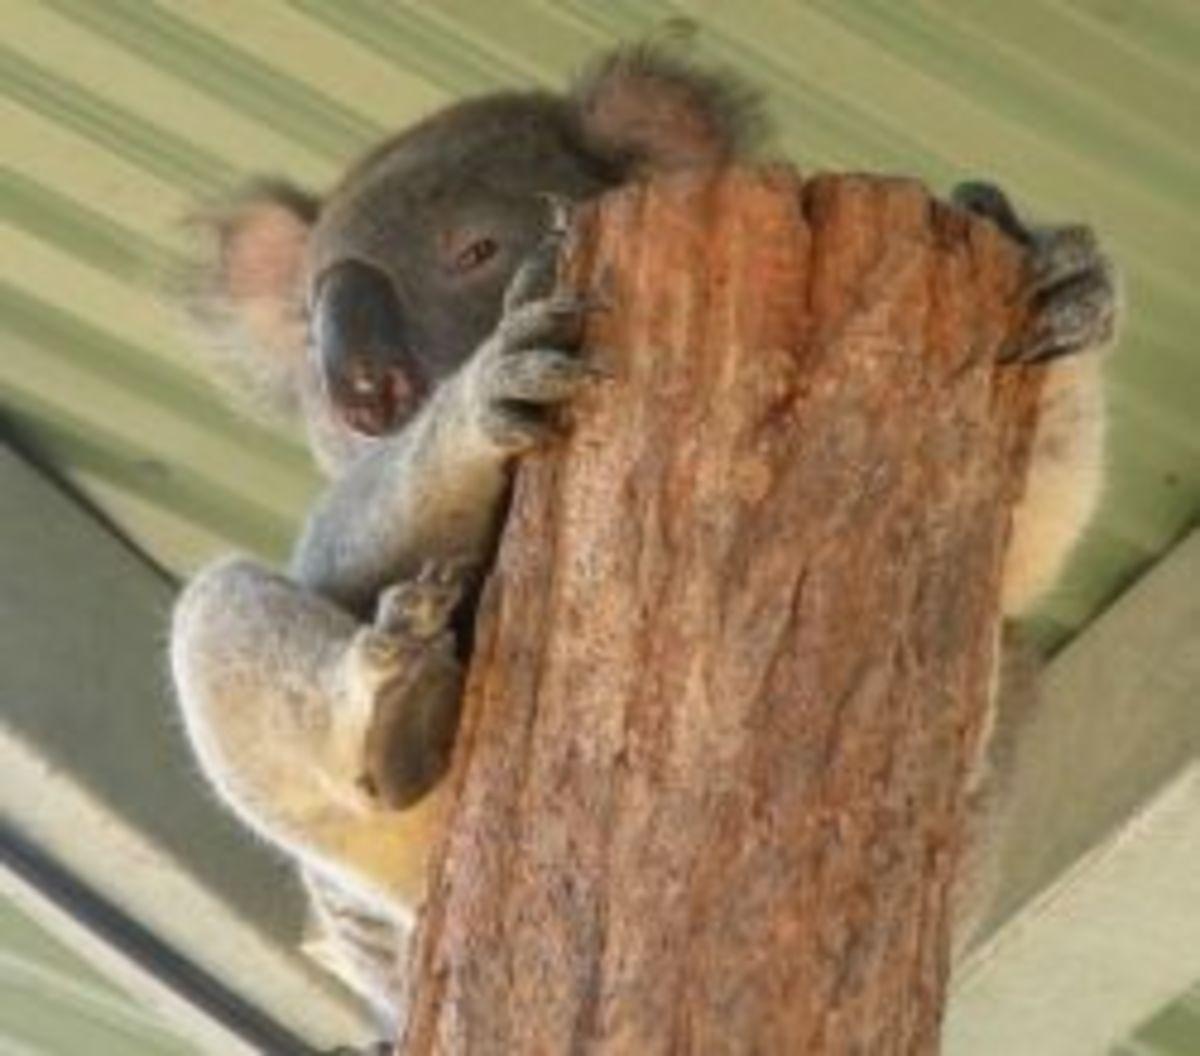 koalas-sleepy-critters-but-still-adorable